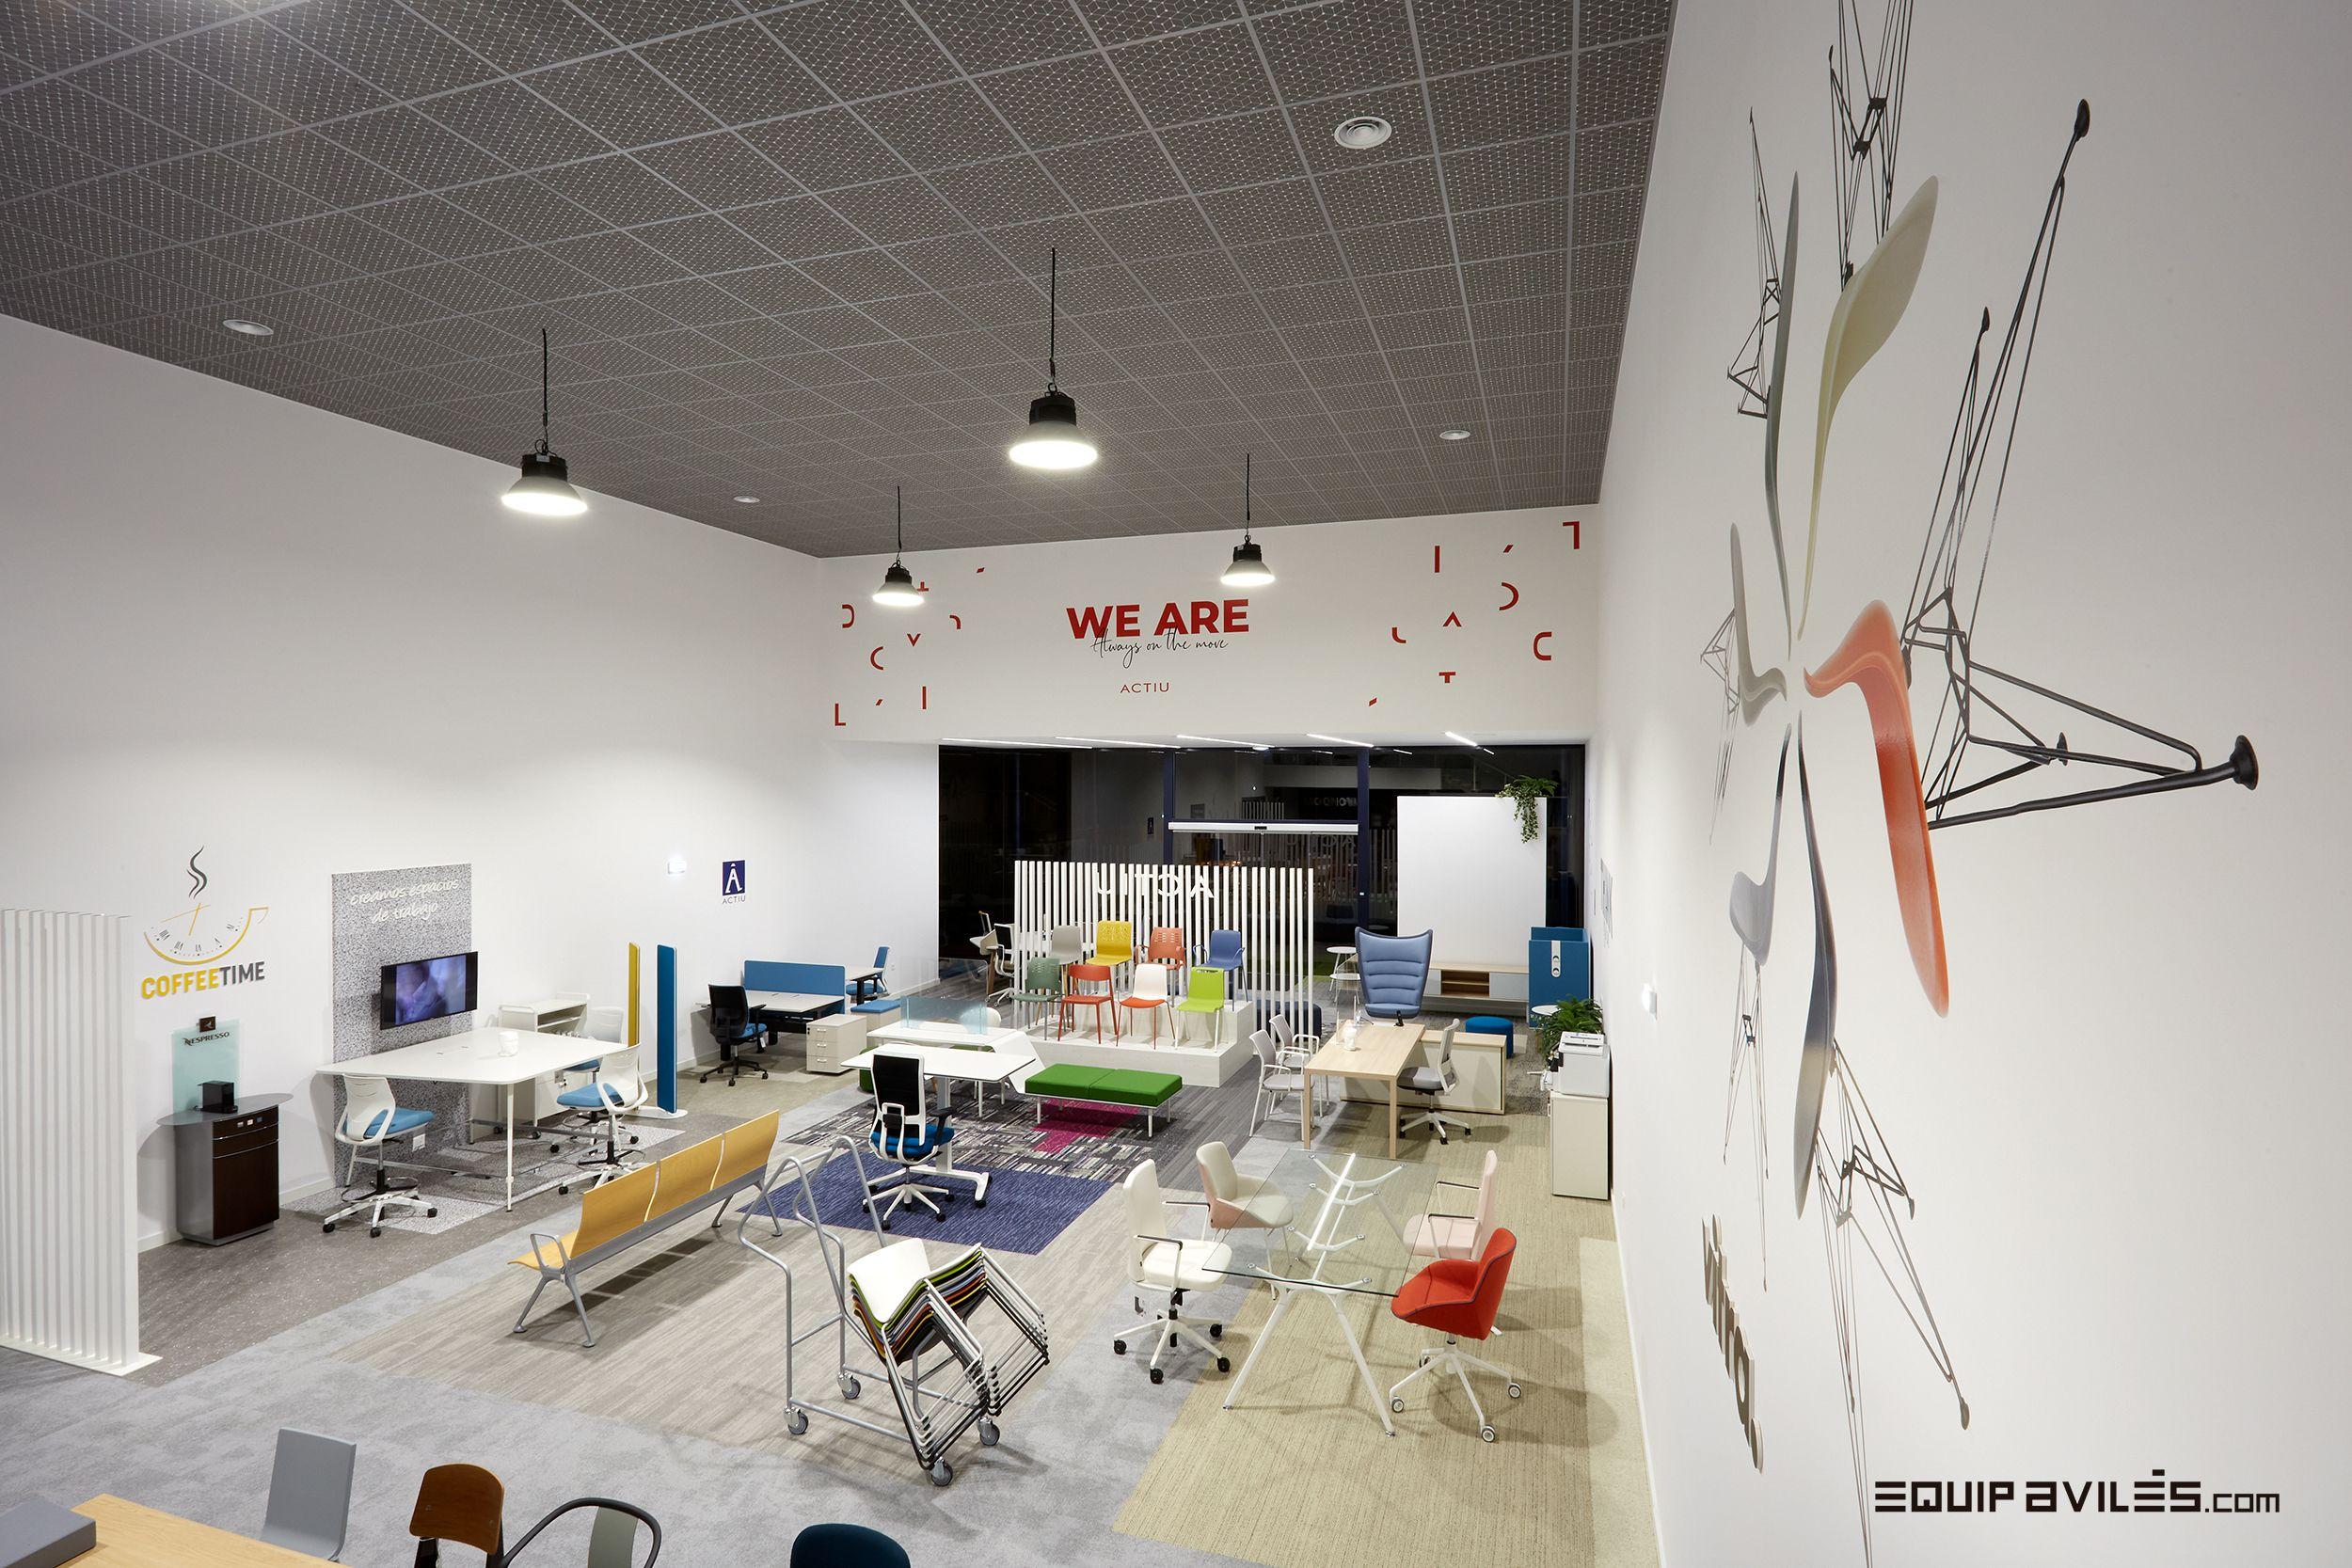 Showroom Cliente ACTIU Equiavilés